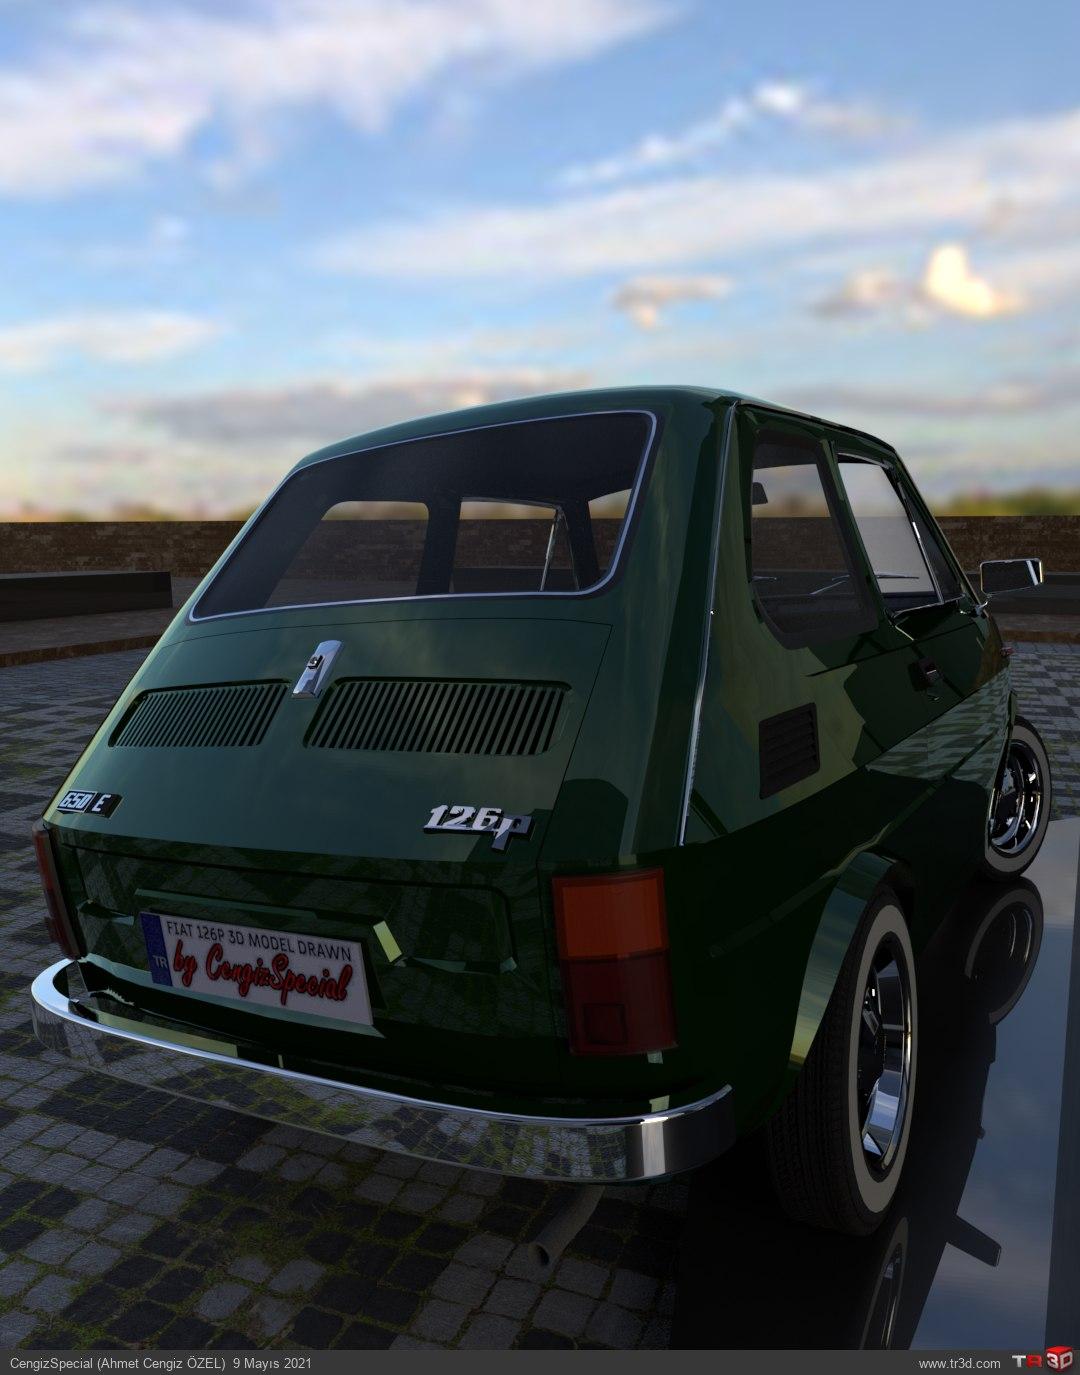 Fiat 126p Araba Çizimi (1976) 2